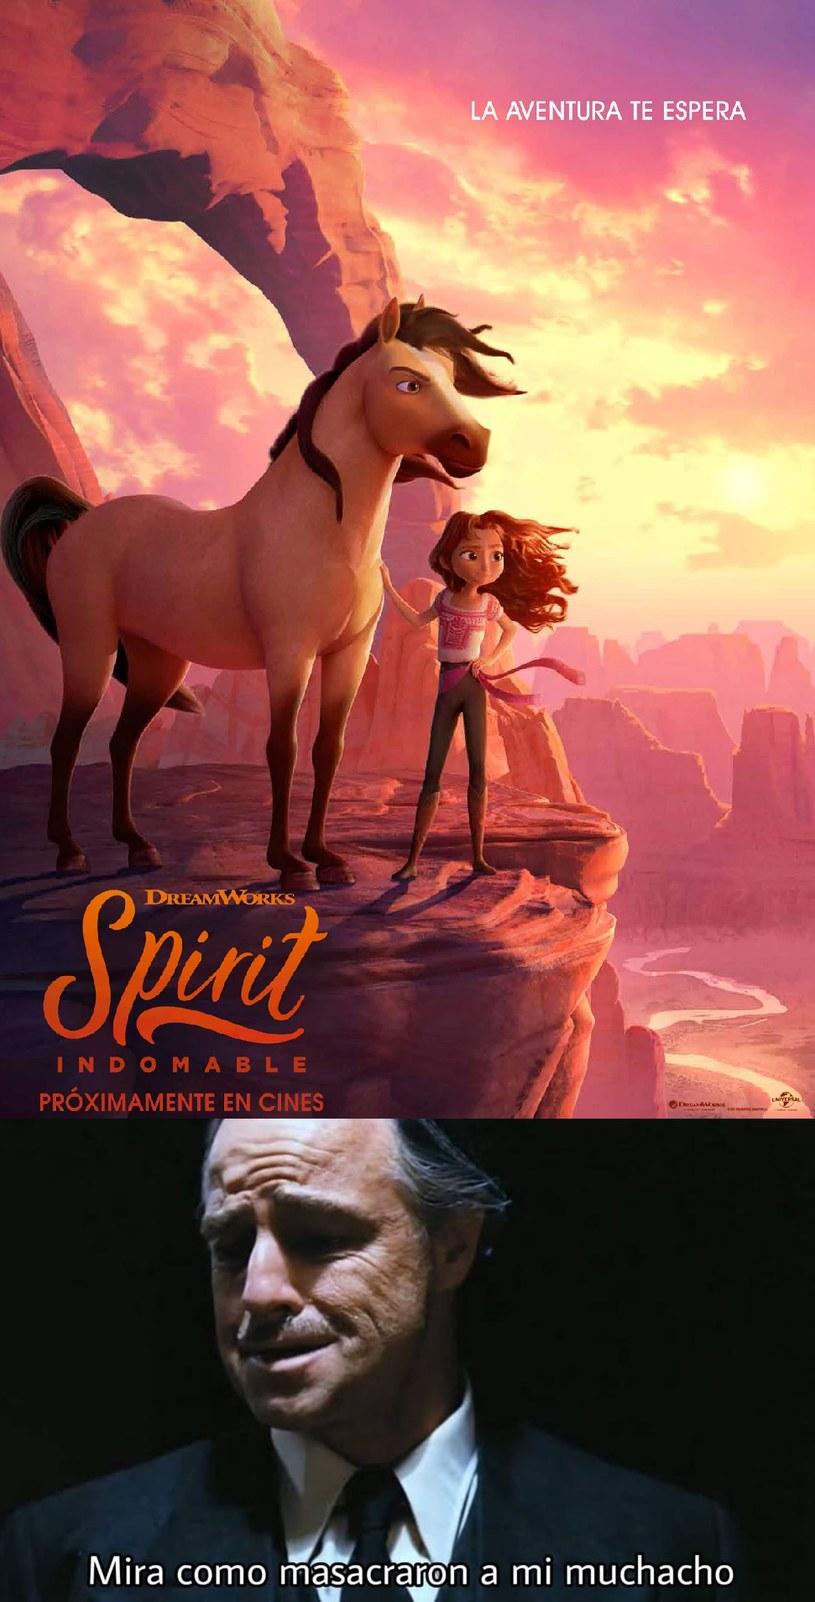 Spirit no se lo merecia :( - meme